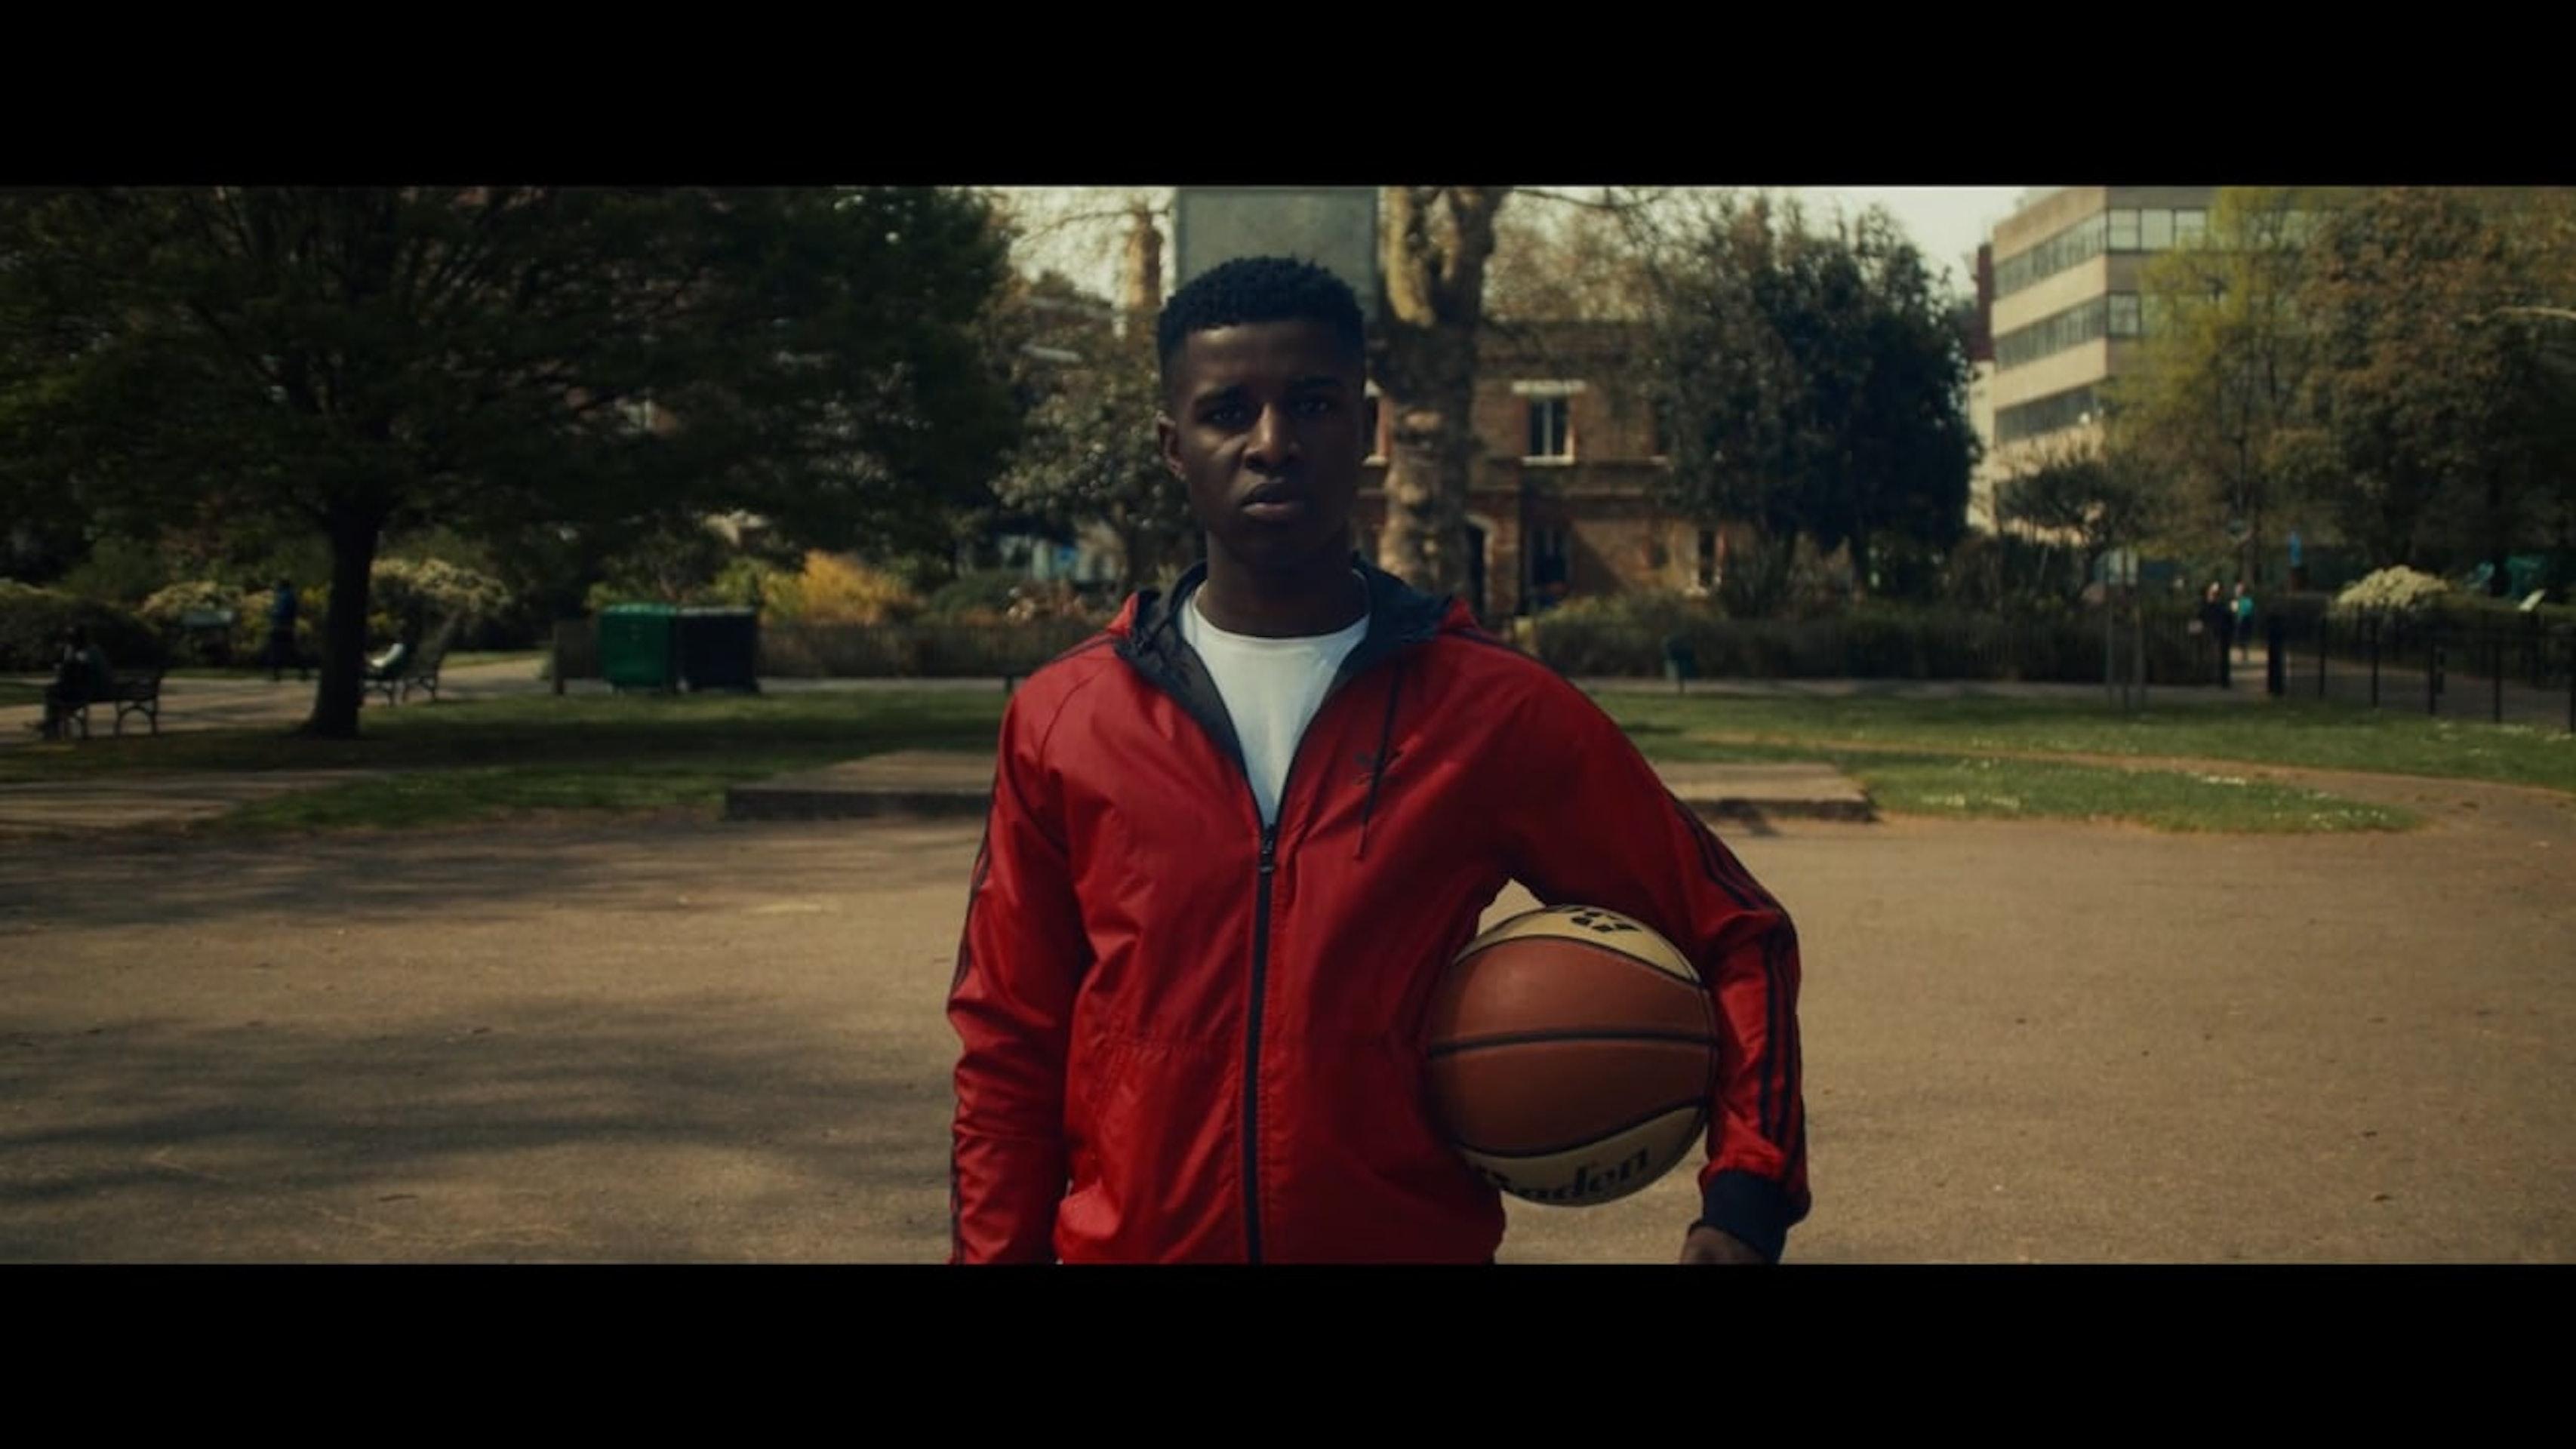 Adidas Originals - Original is Here